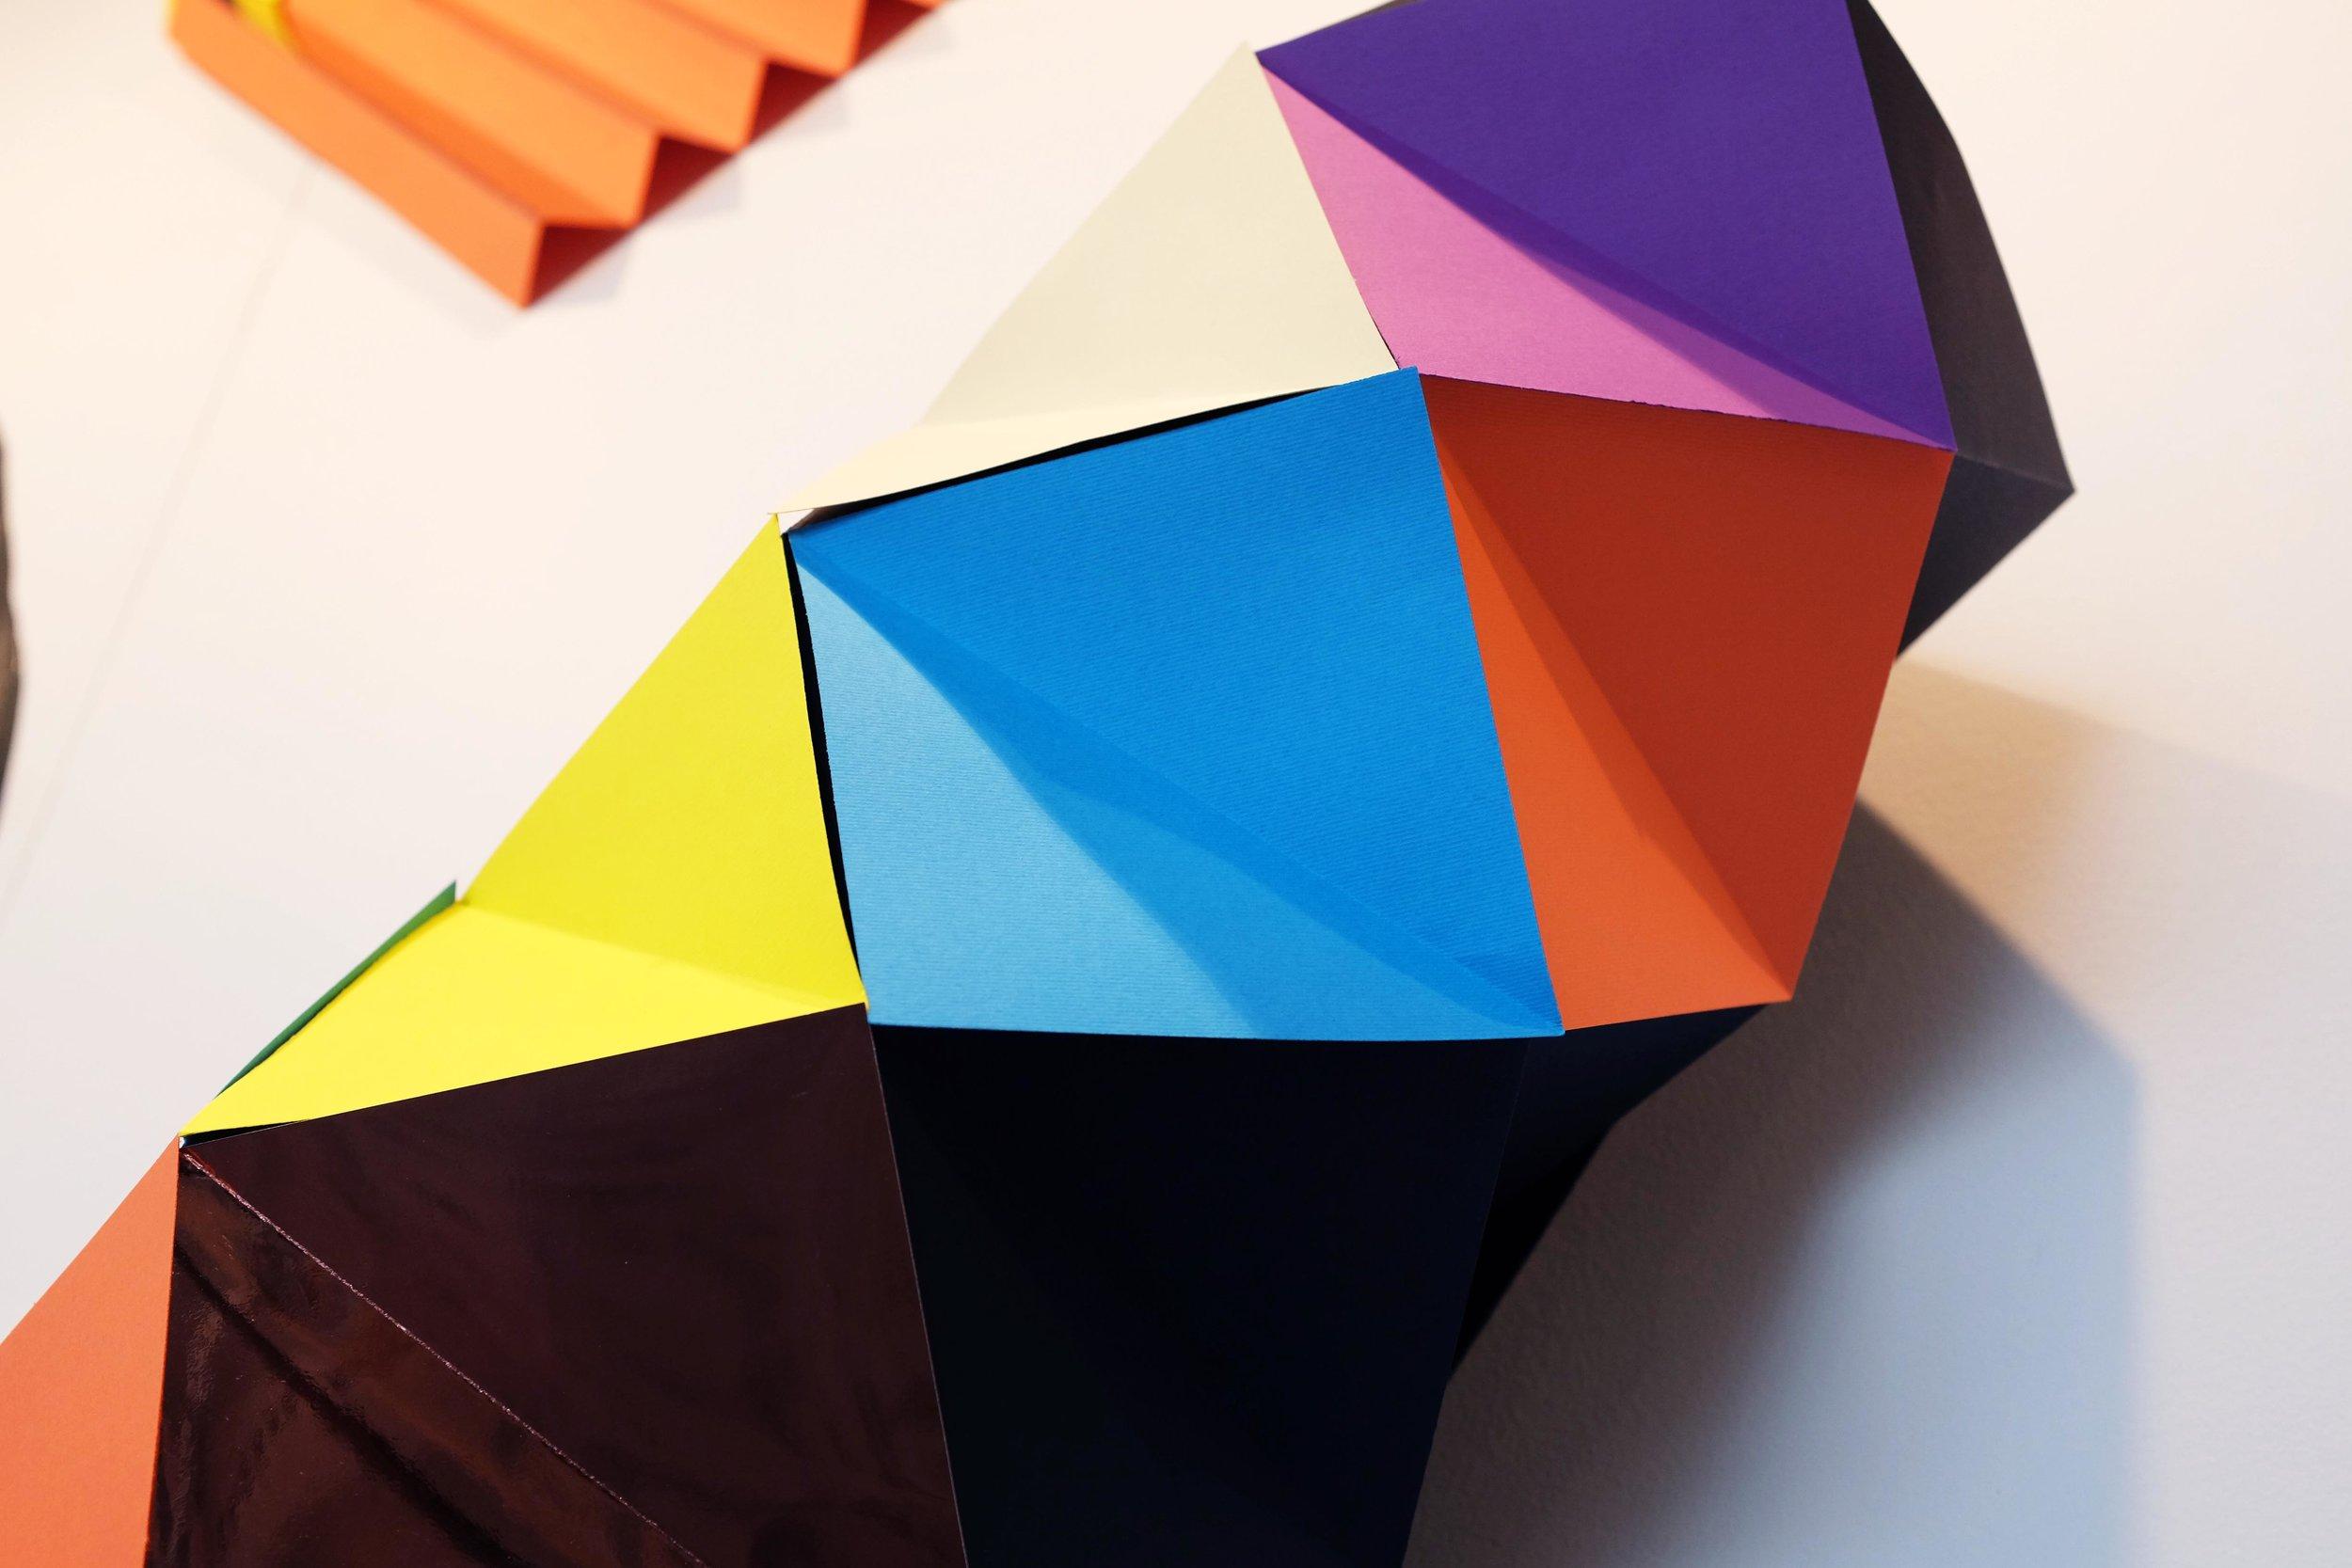 miss-cloudy-pauline-loctin-artist-project-2019-paper-art-origami-entrance-toronto-7.jpg